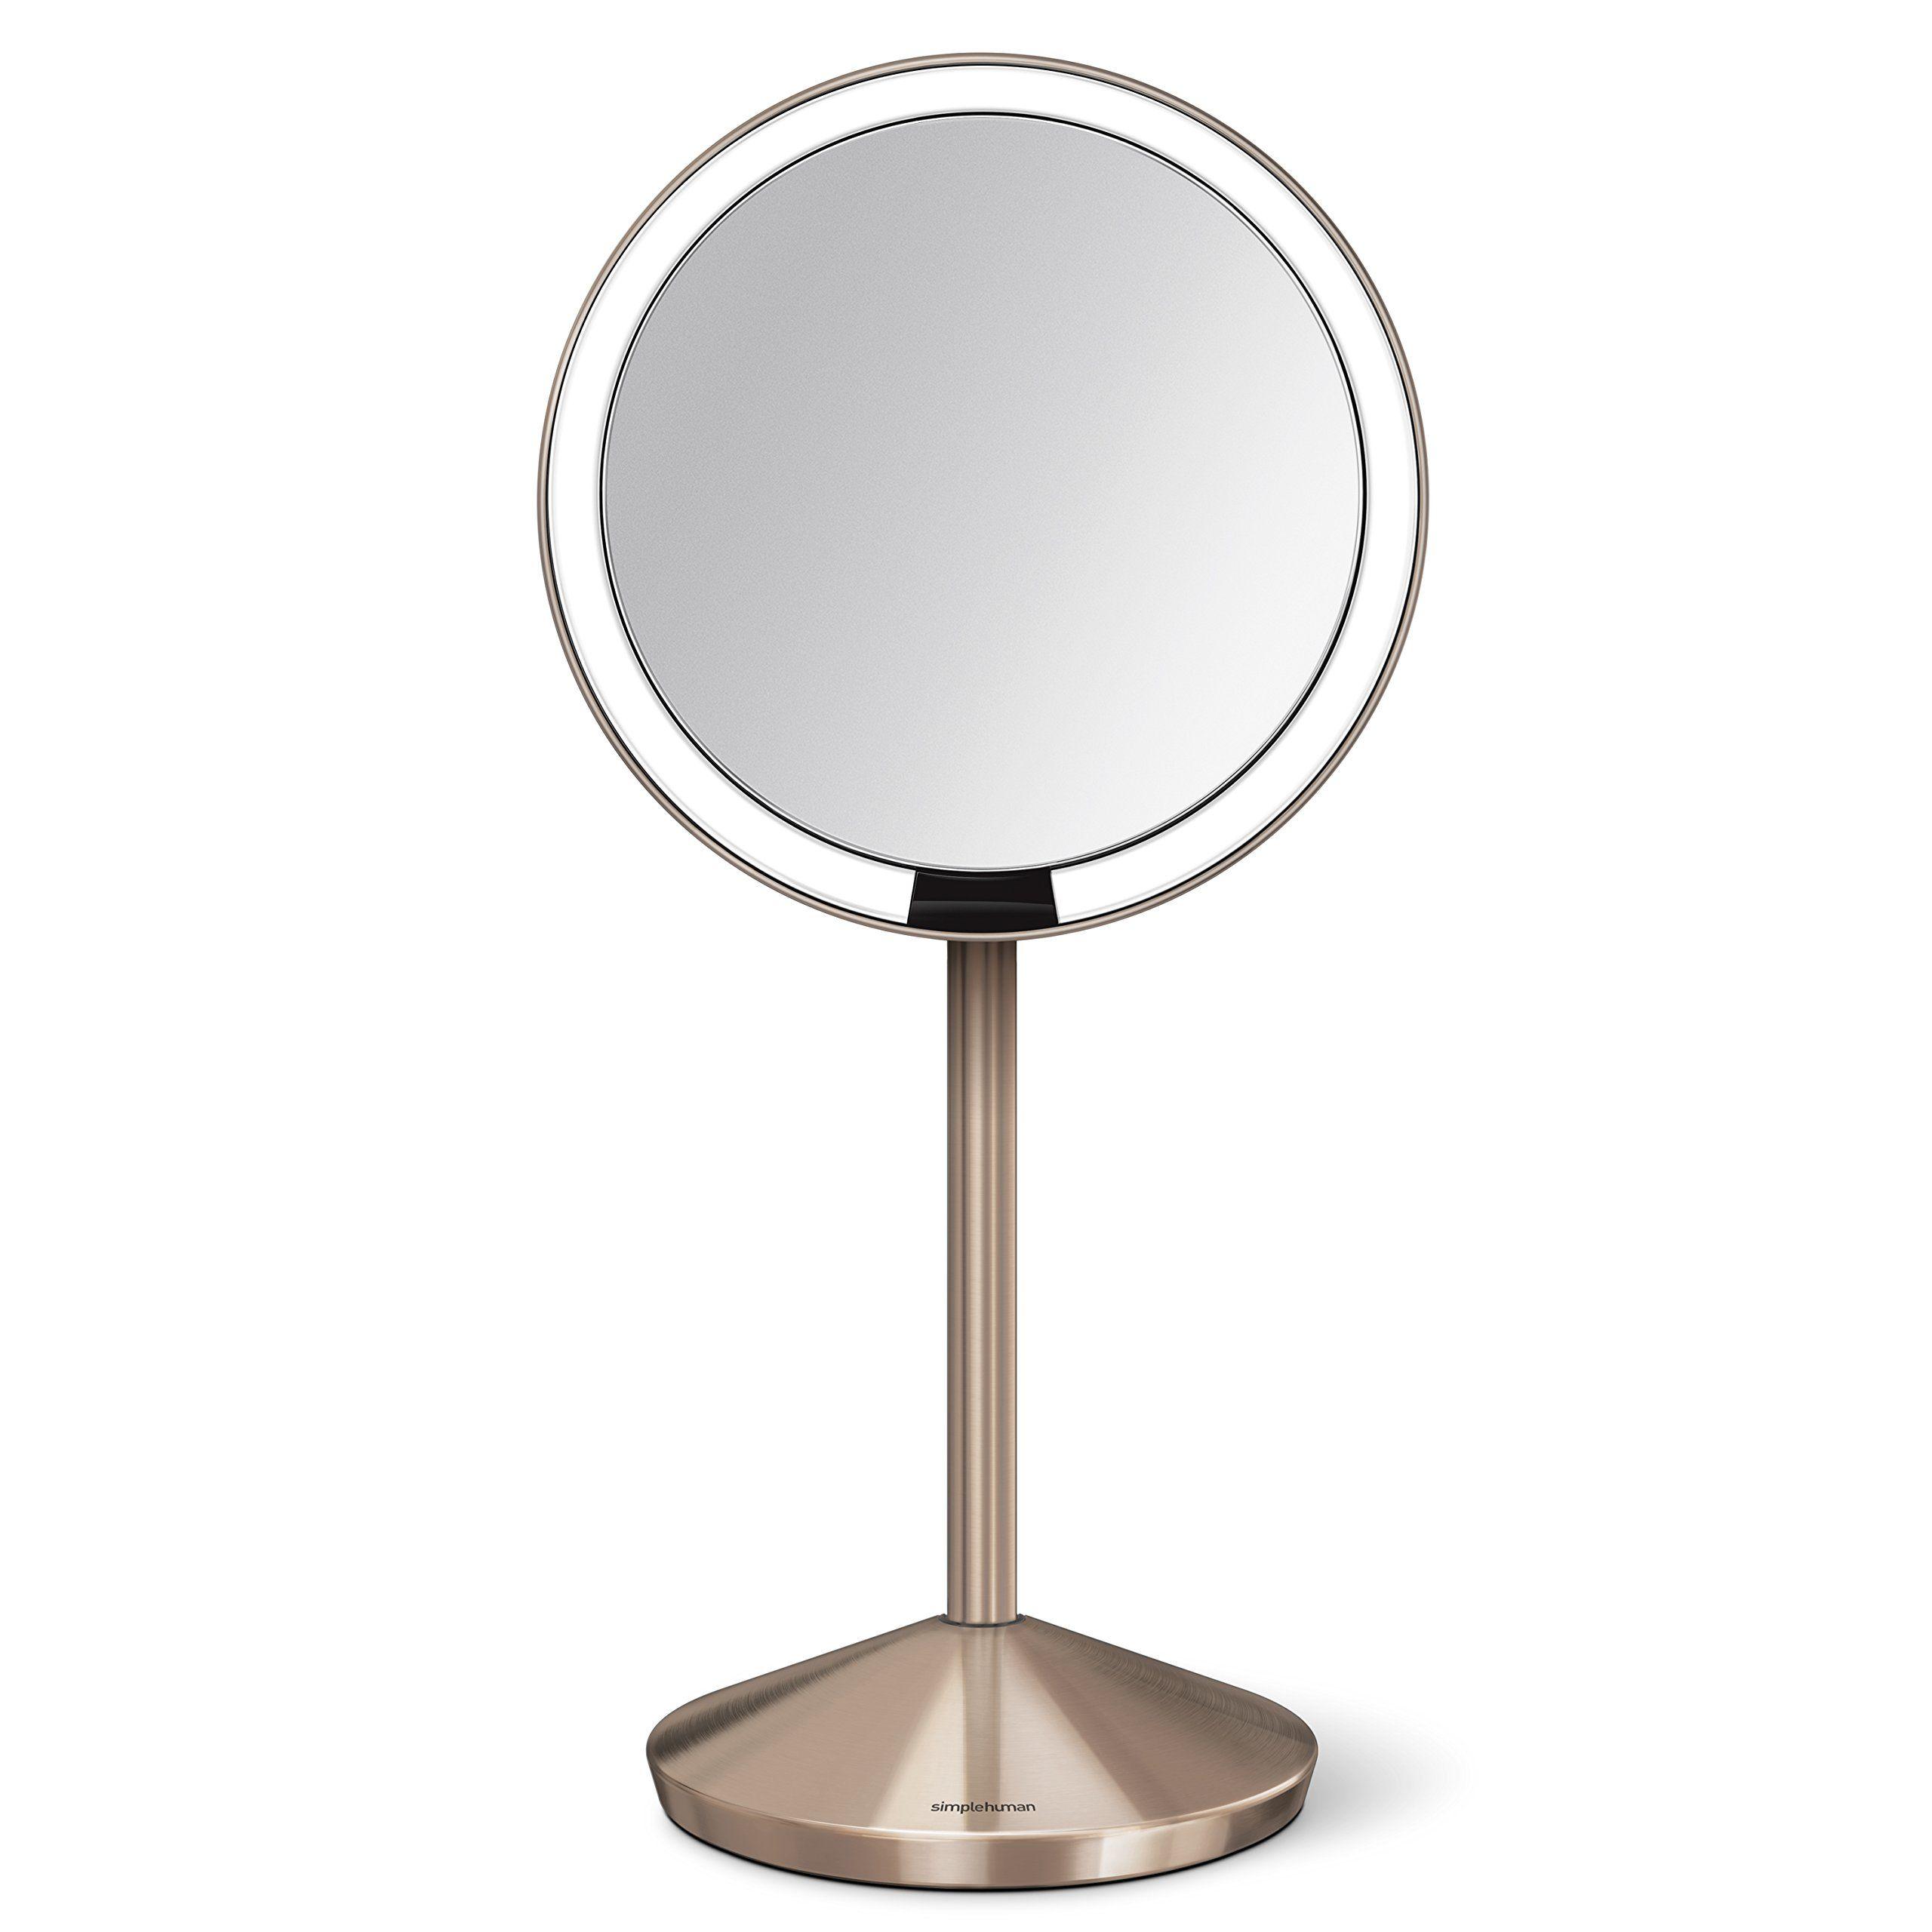 Simplehuman 5 Inch Sensor Mirror Lighted Makeup Mirror 10x